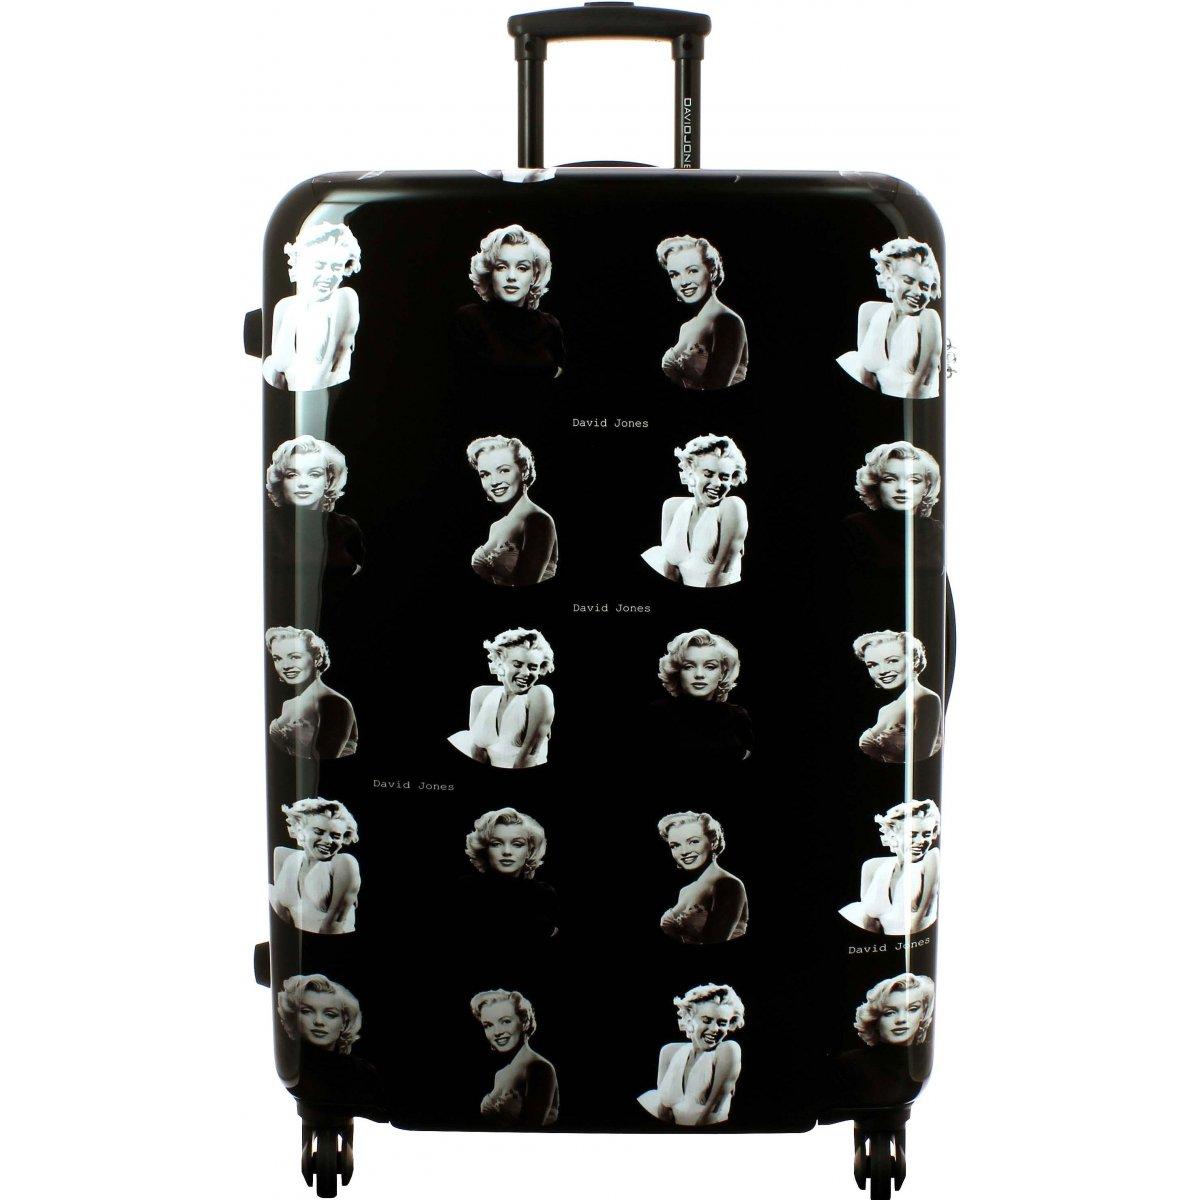 valise rigide david jones taille g 75cm ba20531g couleur principale marilyn monroe. Black Bedroom Furniture Sets. Home Design Ideas